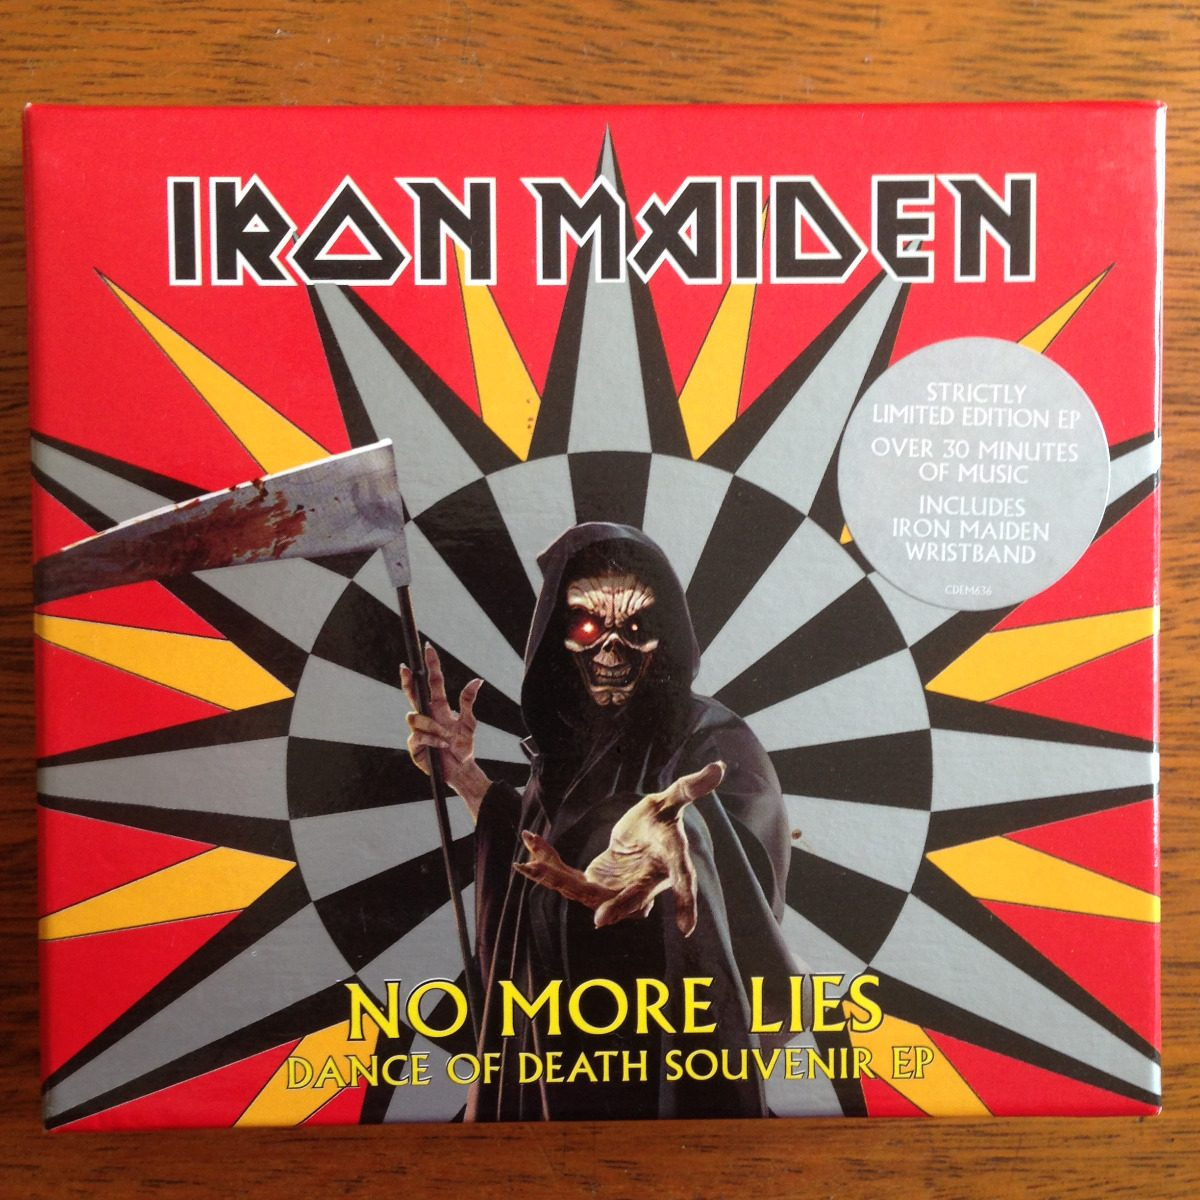 box-iron-maiden-no-more-lies-completo-com-munhequeira-D_NQ_NP_781268-MLB26590770147_012018-F.jpg